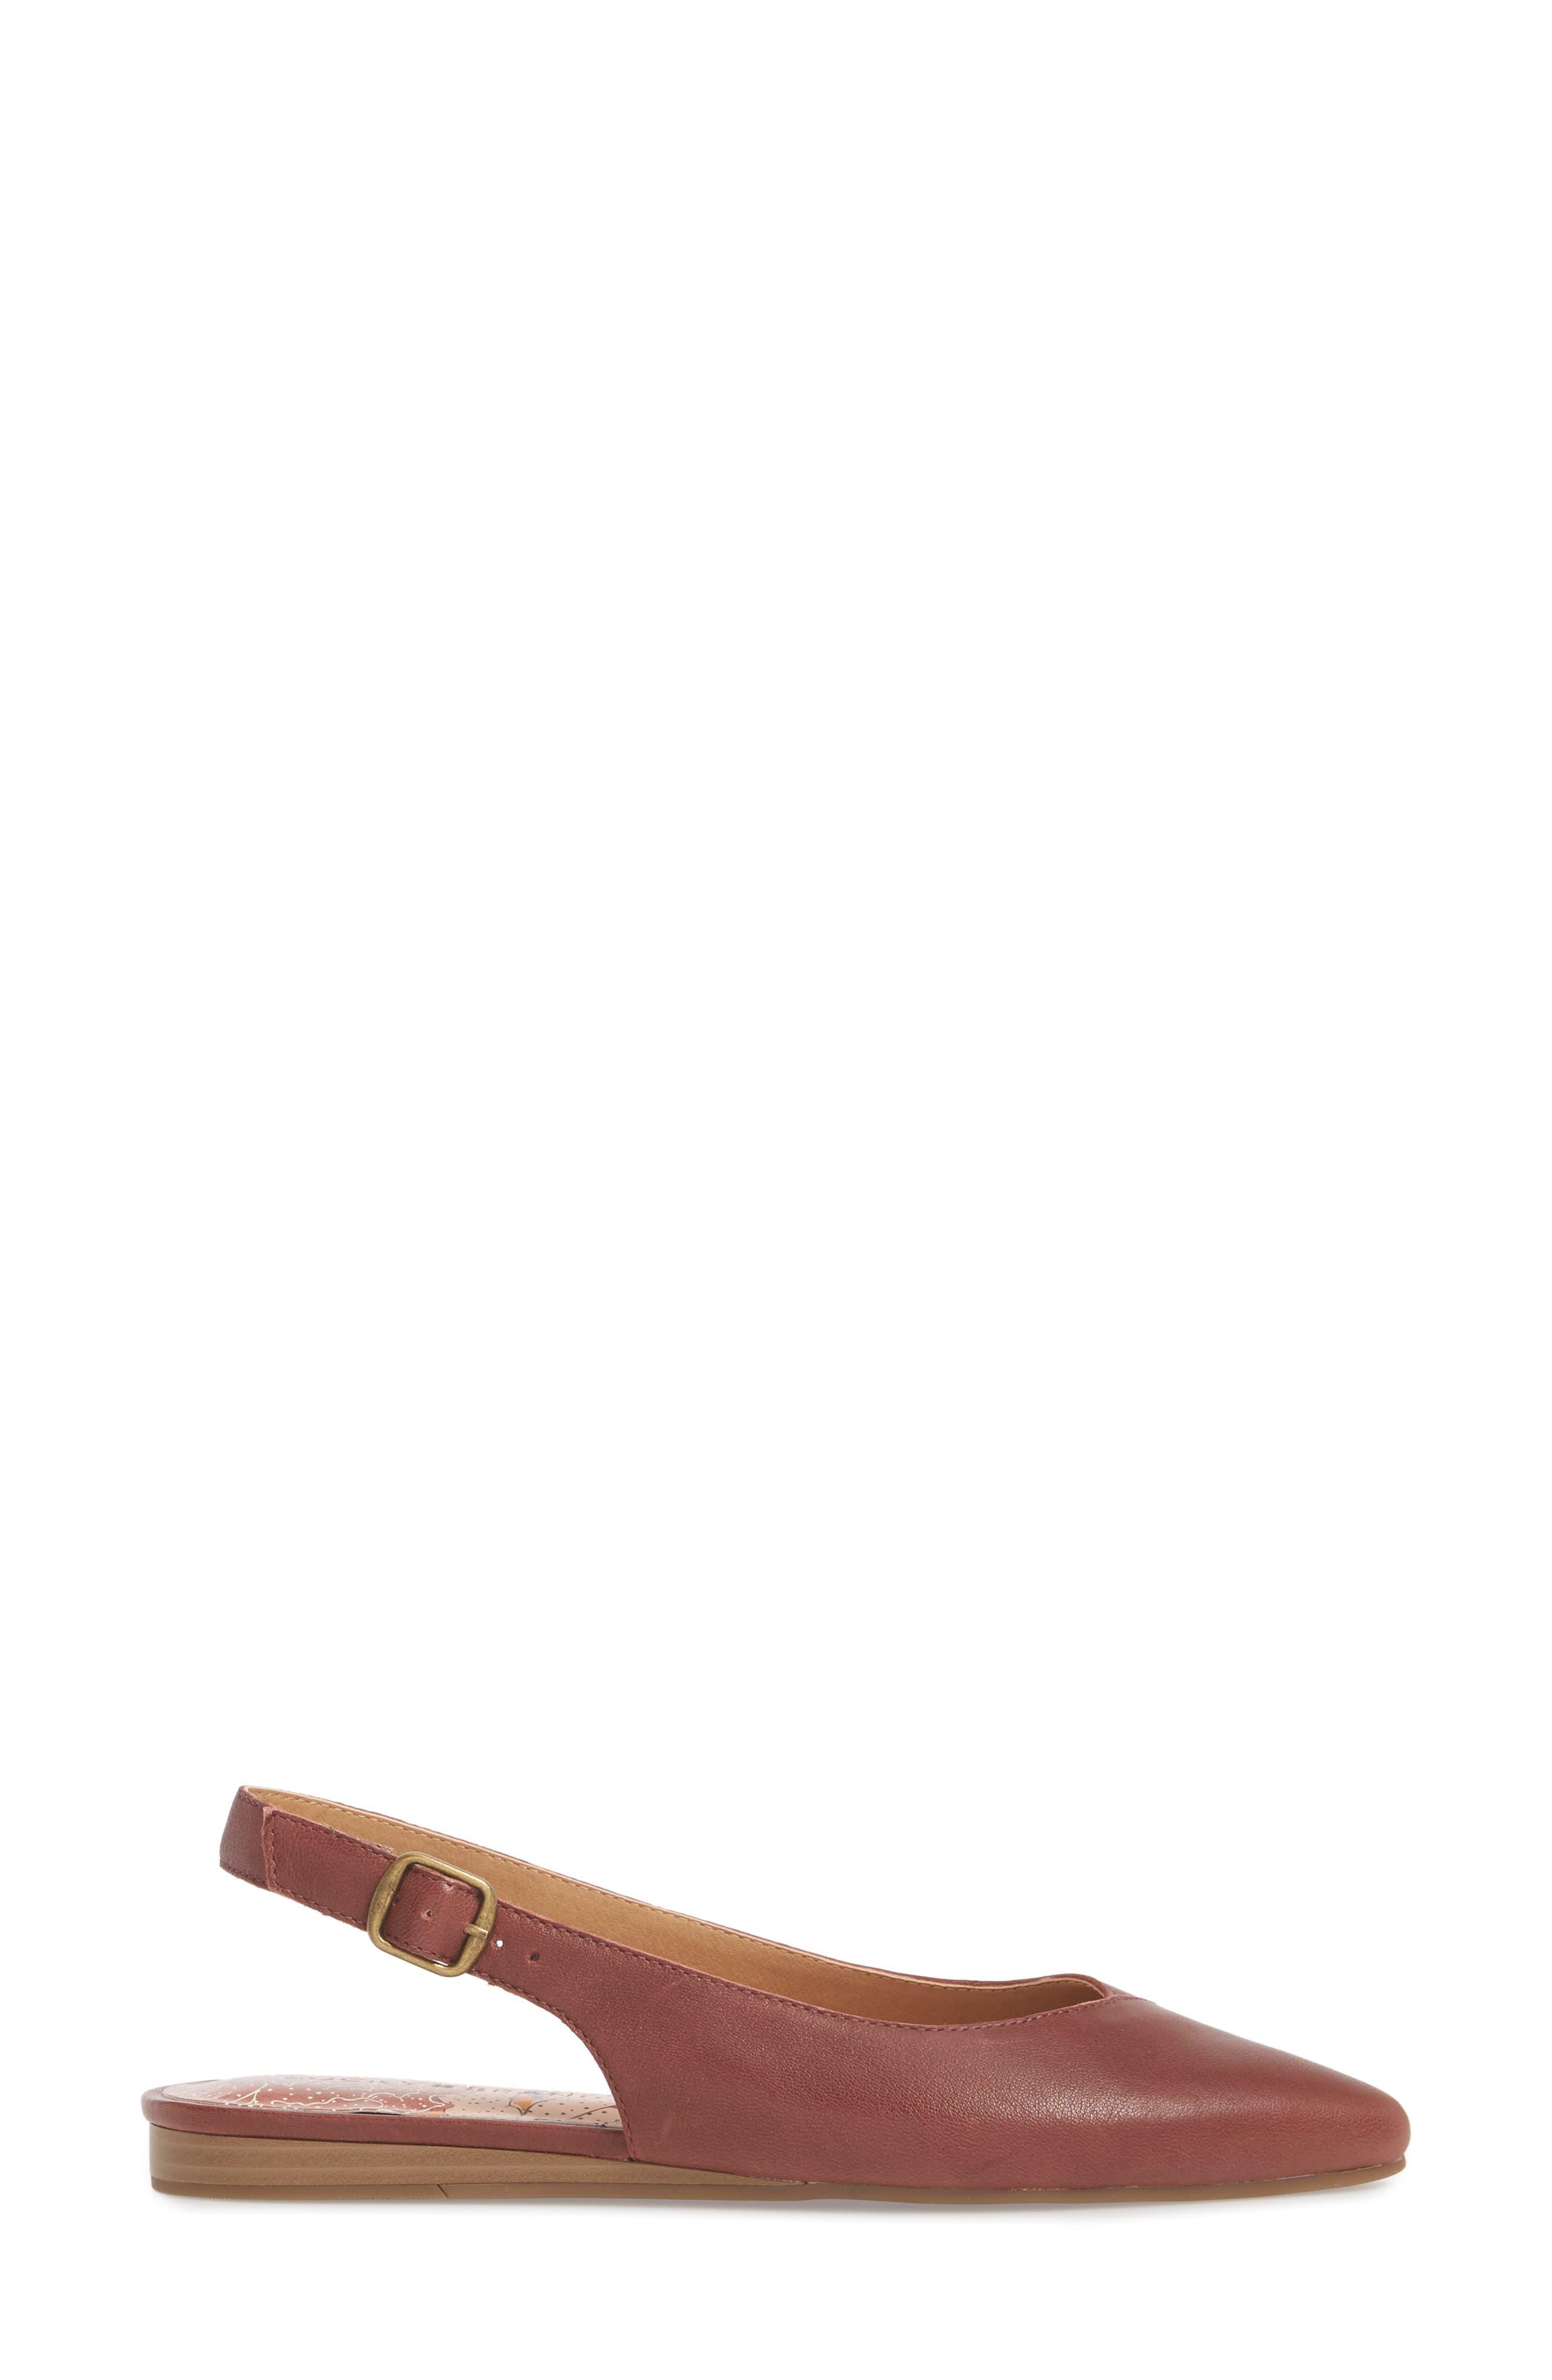 Beratan Slingback Flat,                             Alternate thumbnail 3, color,                             Burgundy Leather